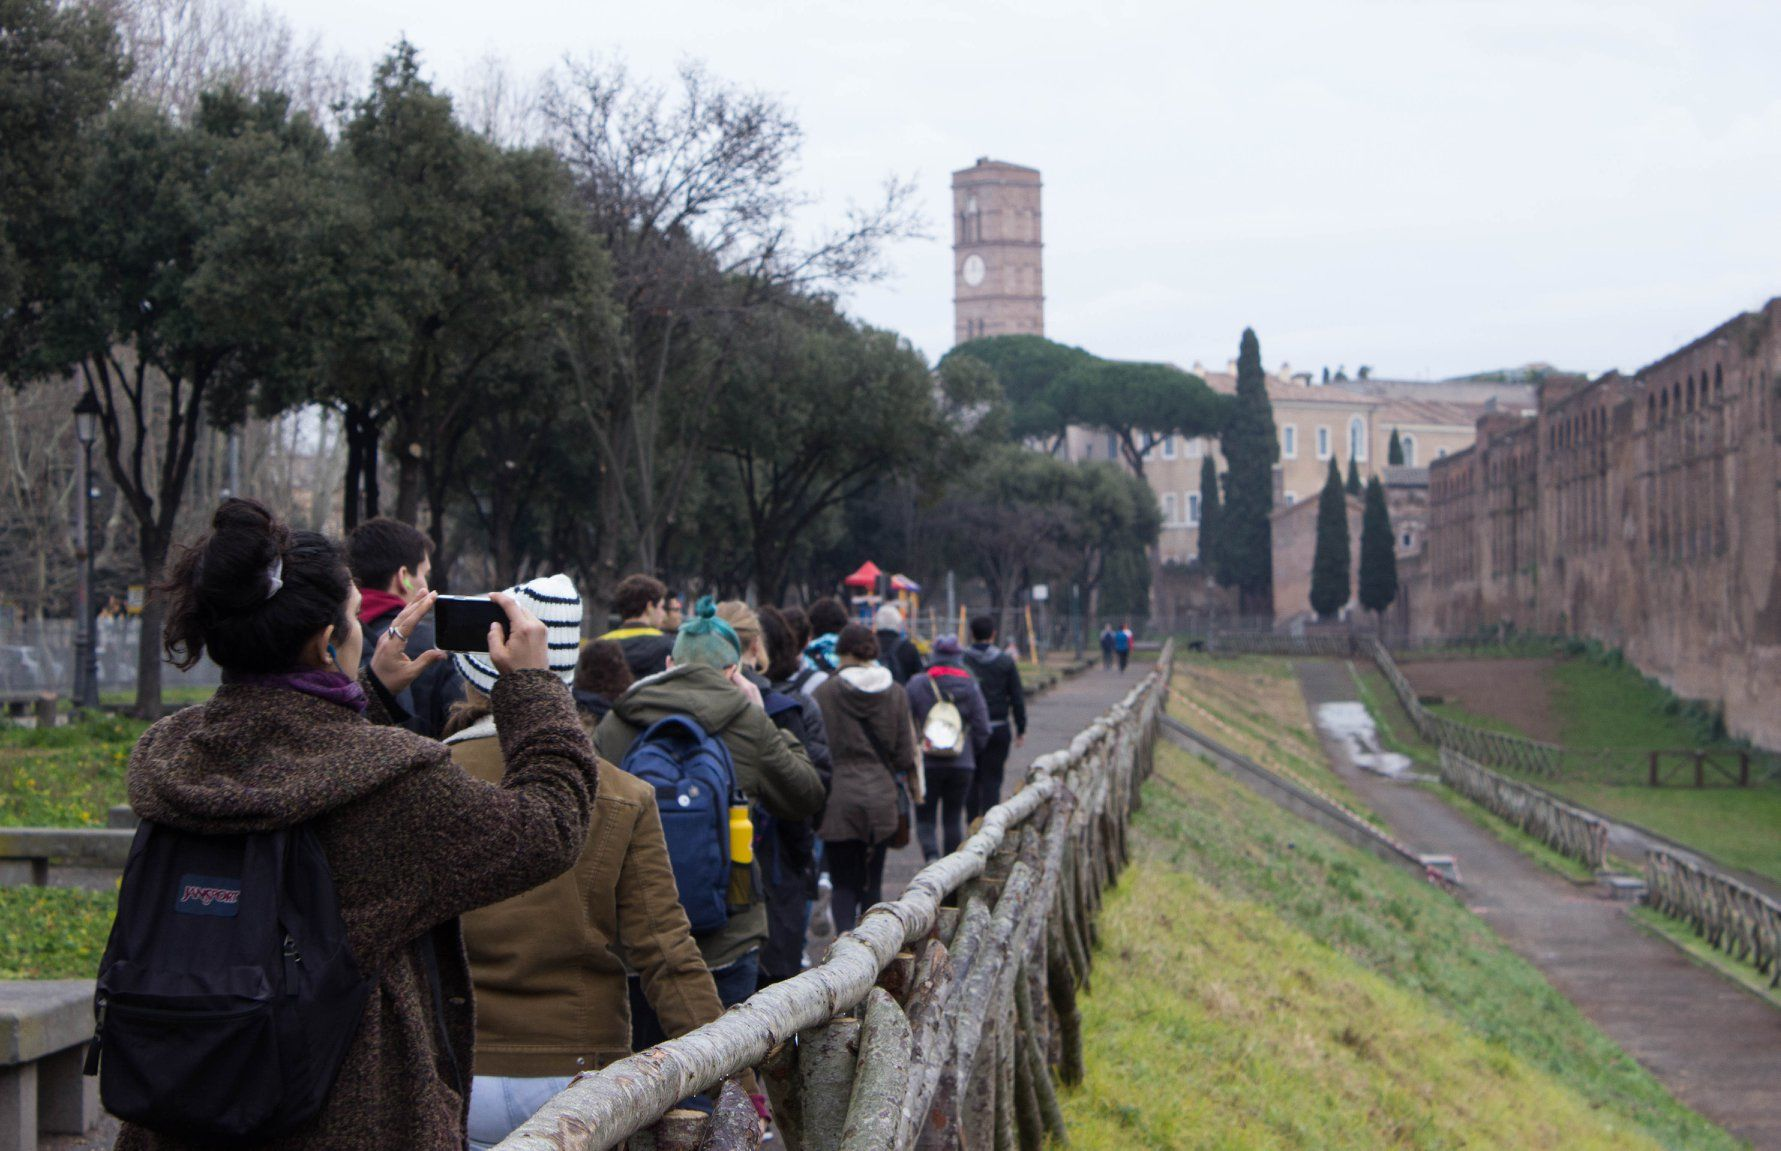 Group of students walking along Aurelian wall of Rome